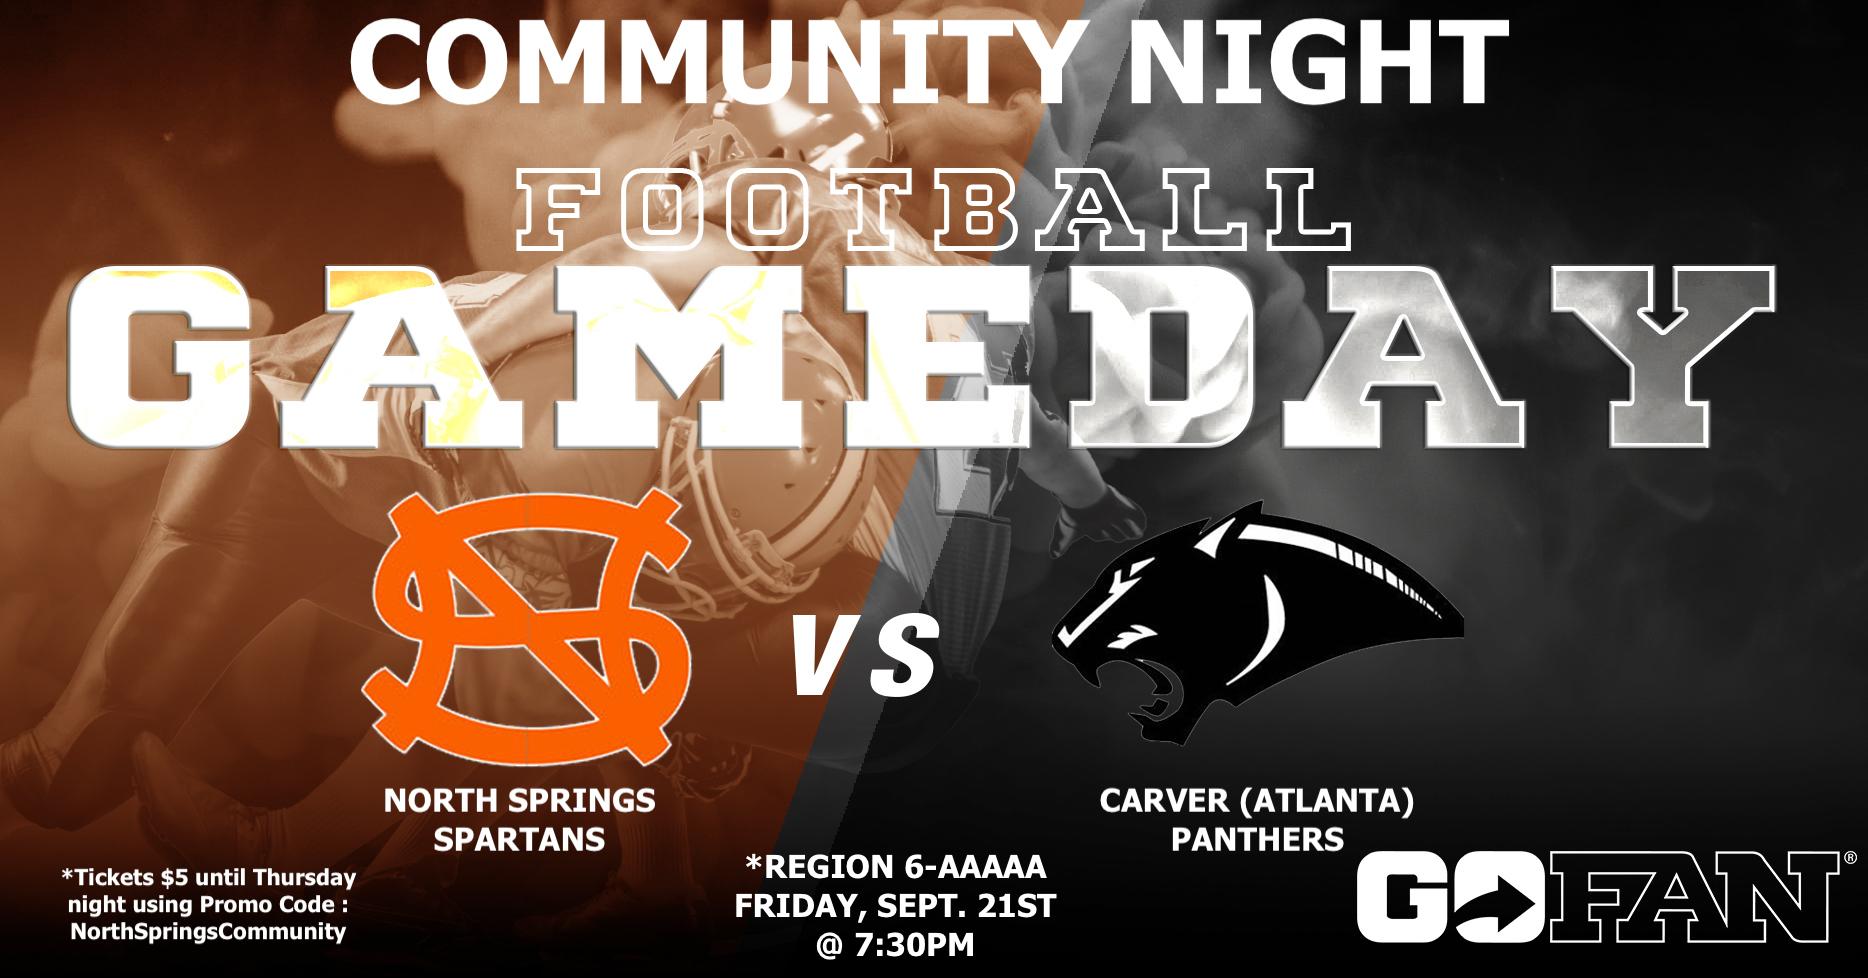 Friday Night Football is Community Night!!!